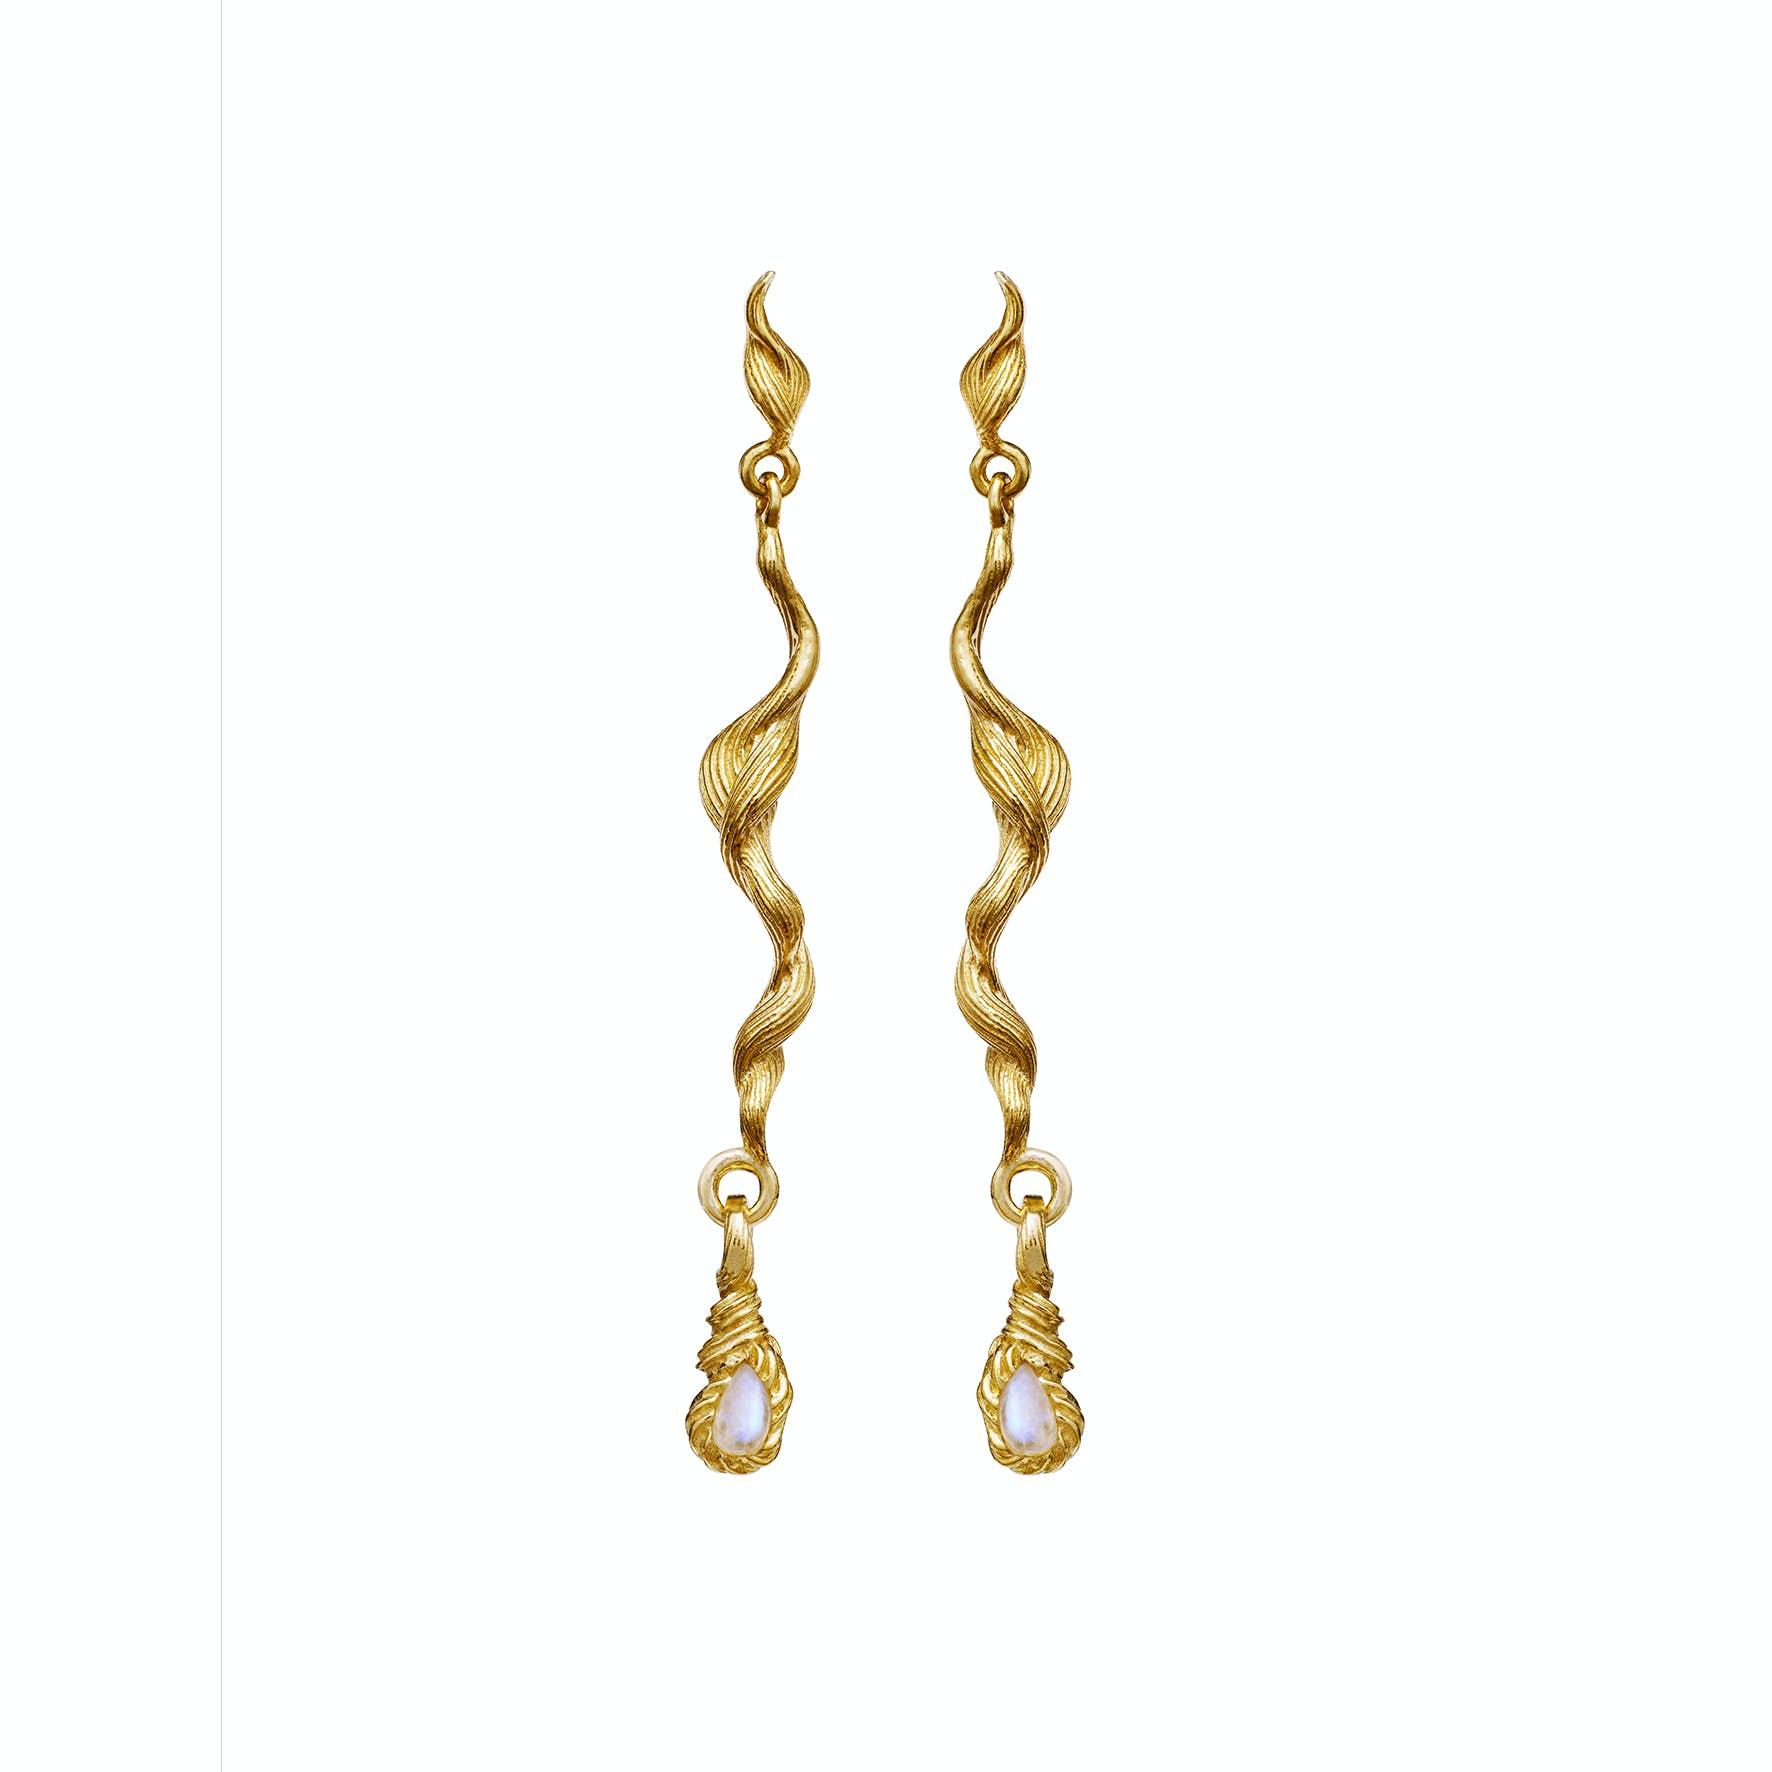 Aqua Earrings von Maanesten in Vergoldet-Silber Sterling 925